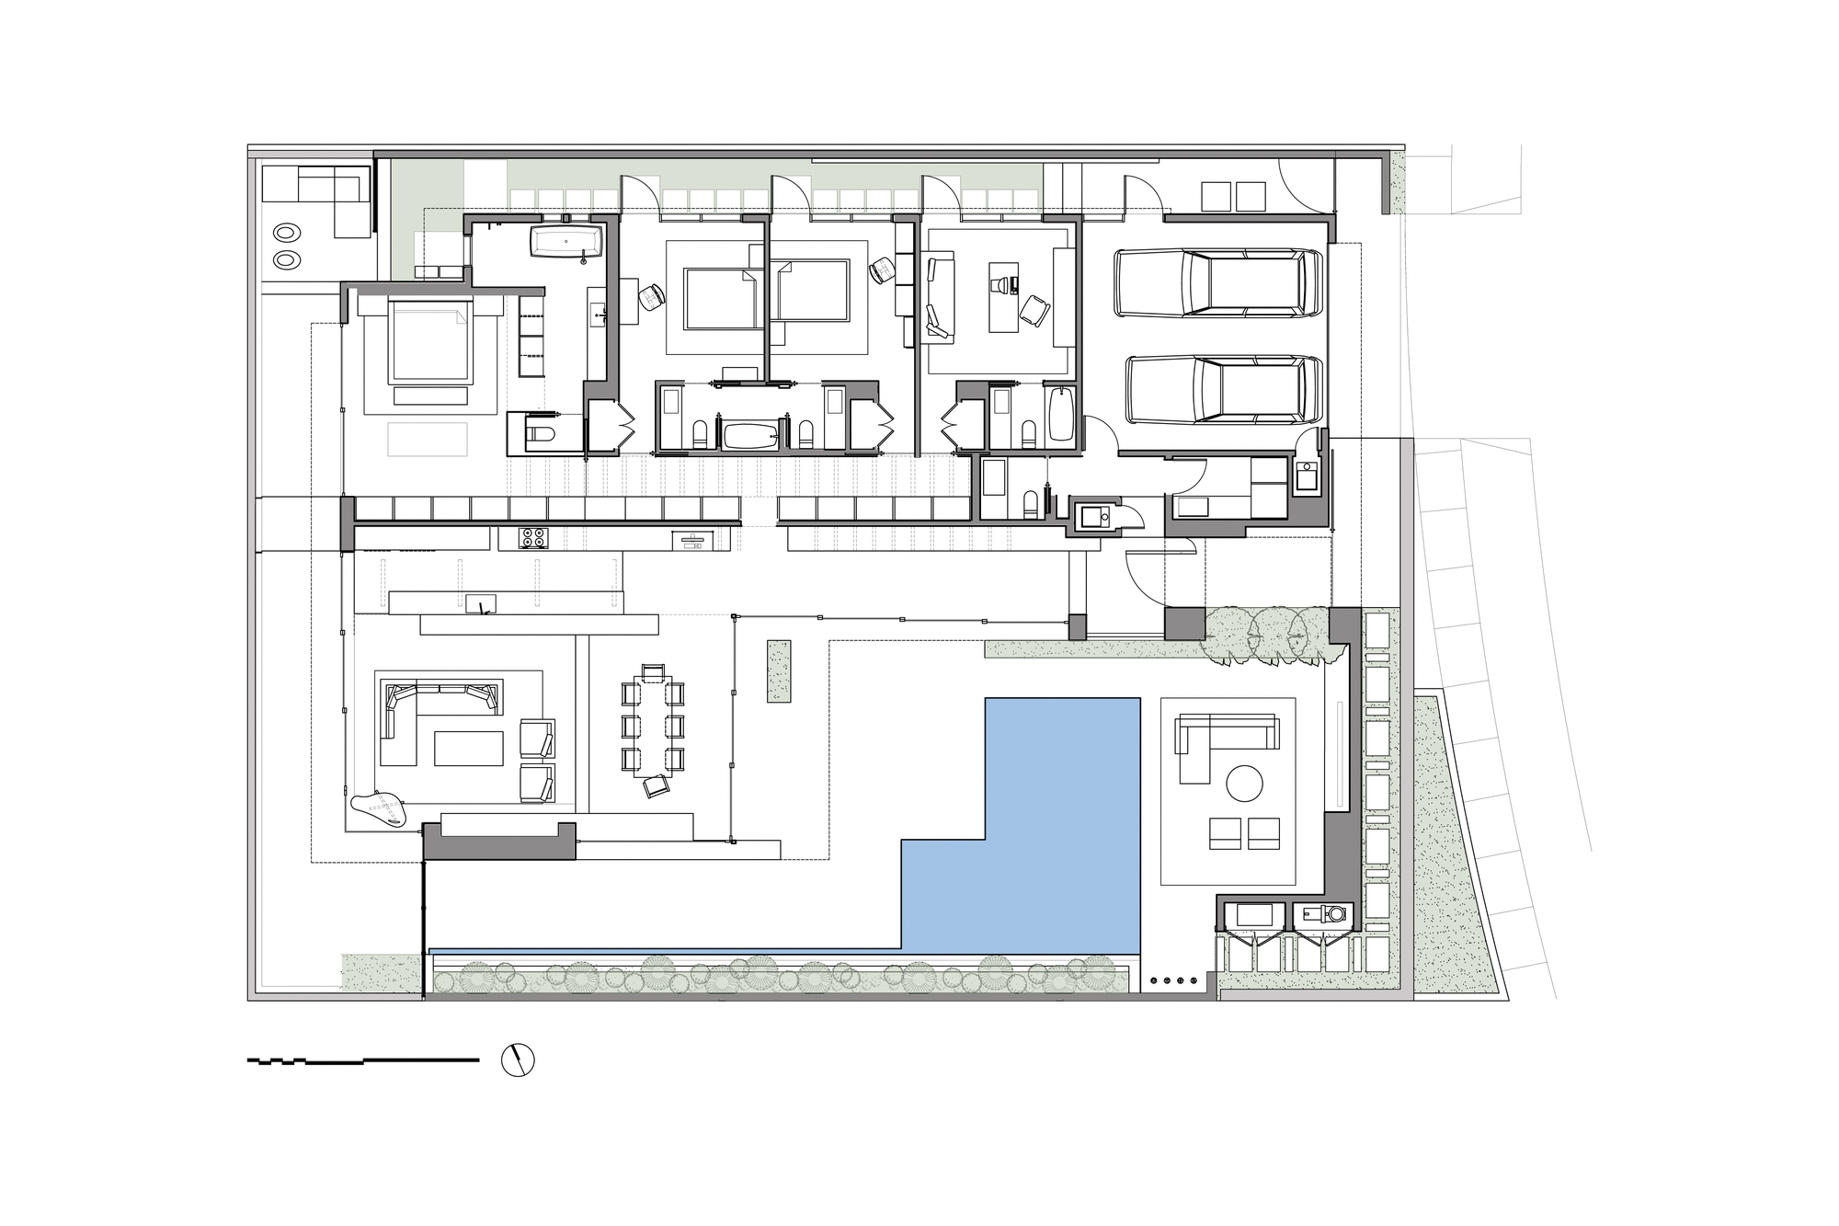 18 – Cormac Residence – 1027 White Sails Way, Corona del Mar, CA, USA